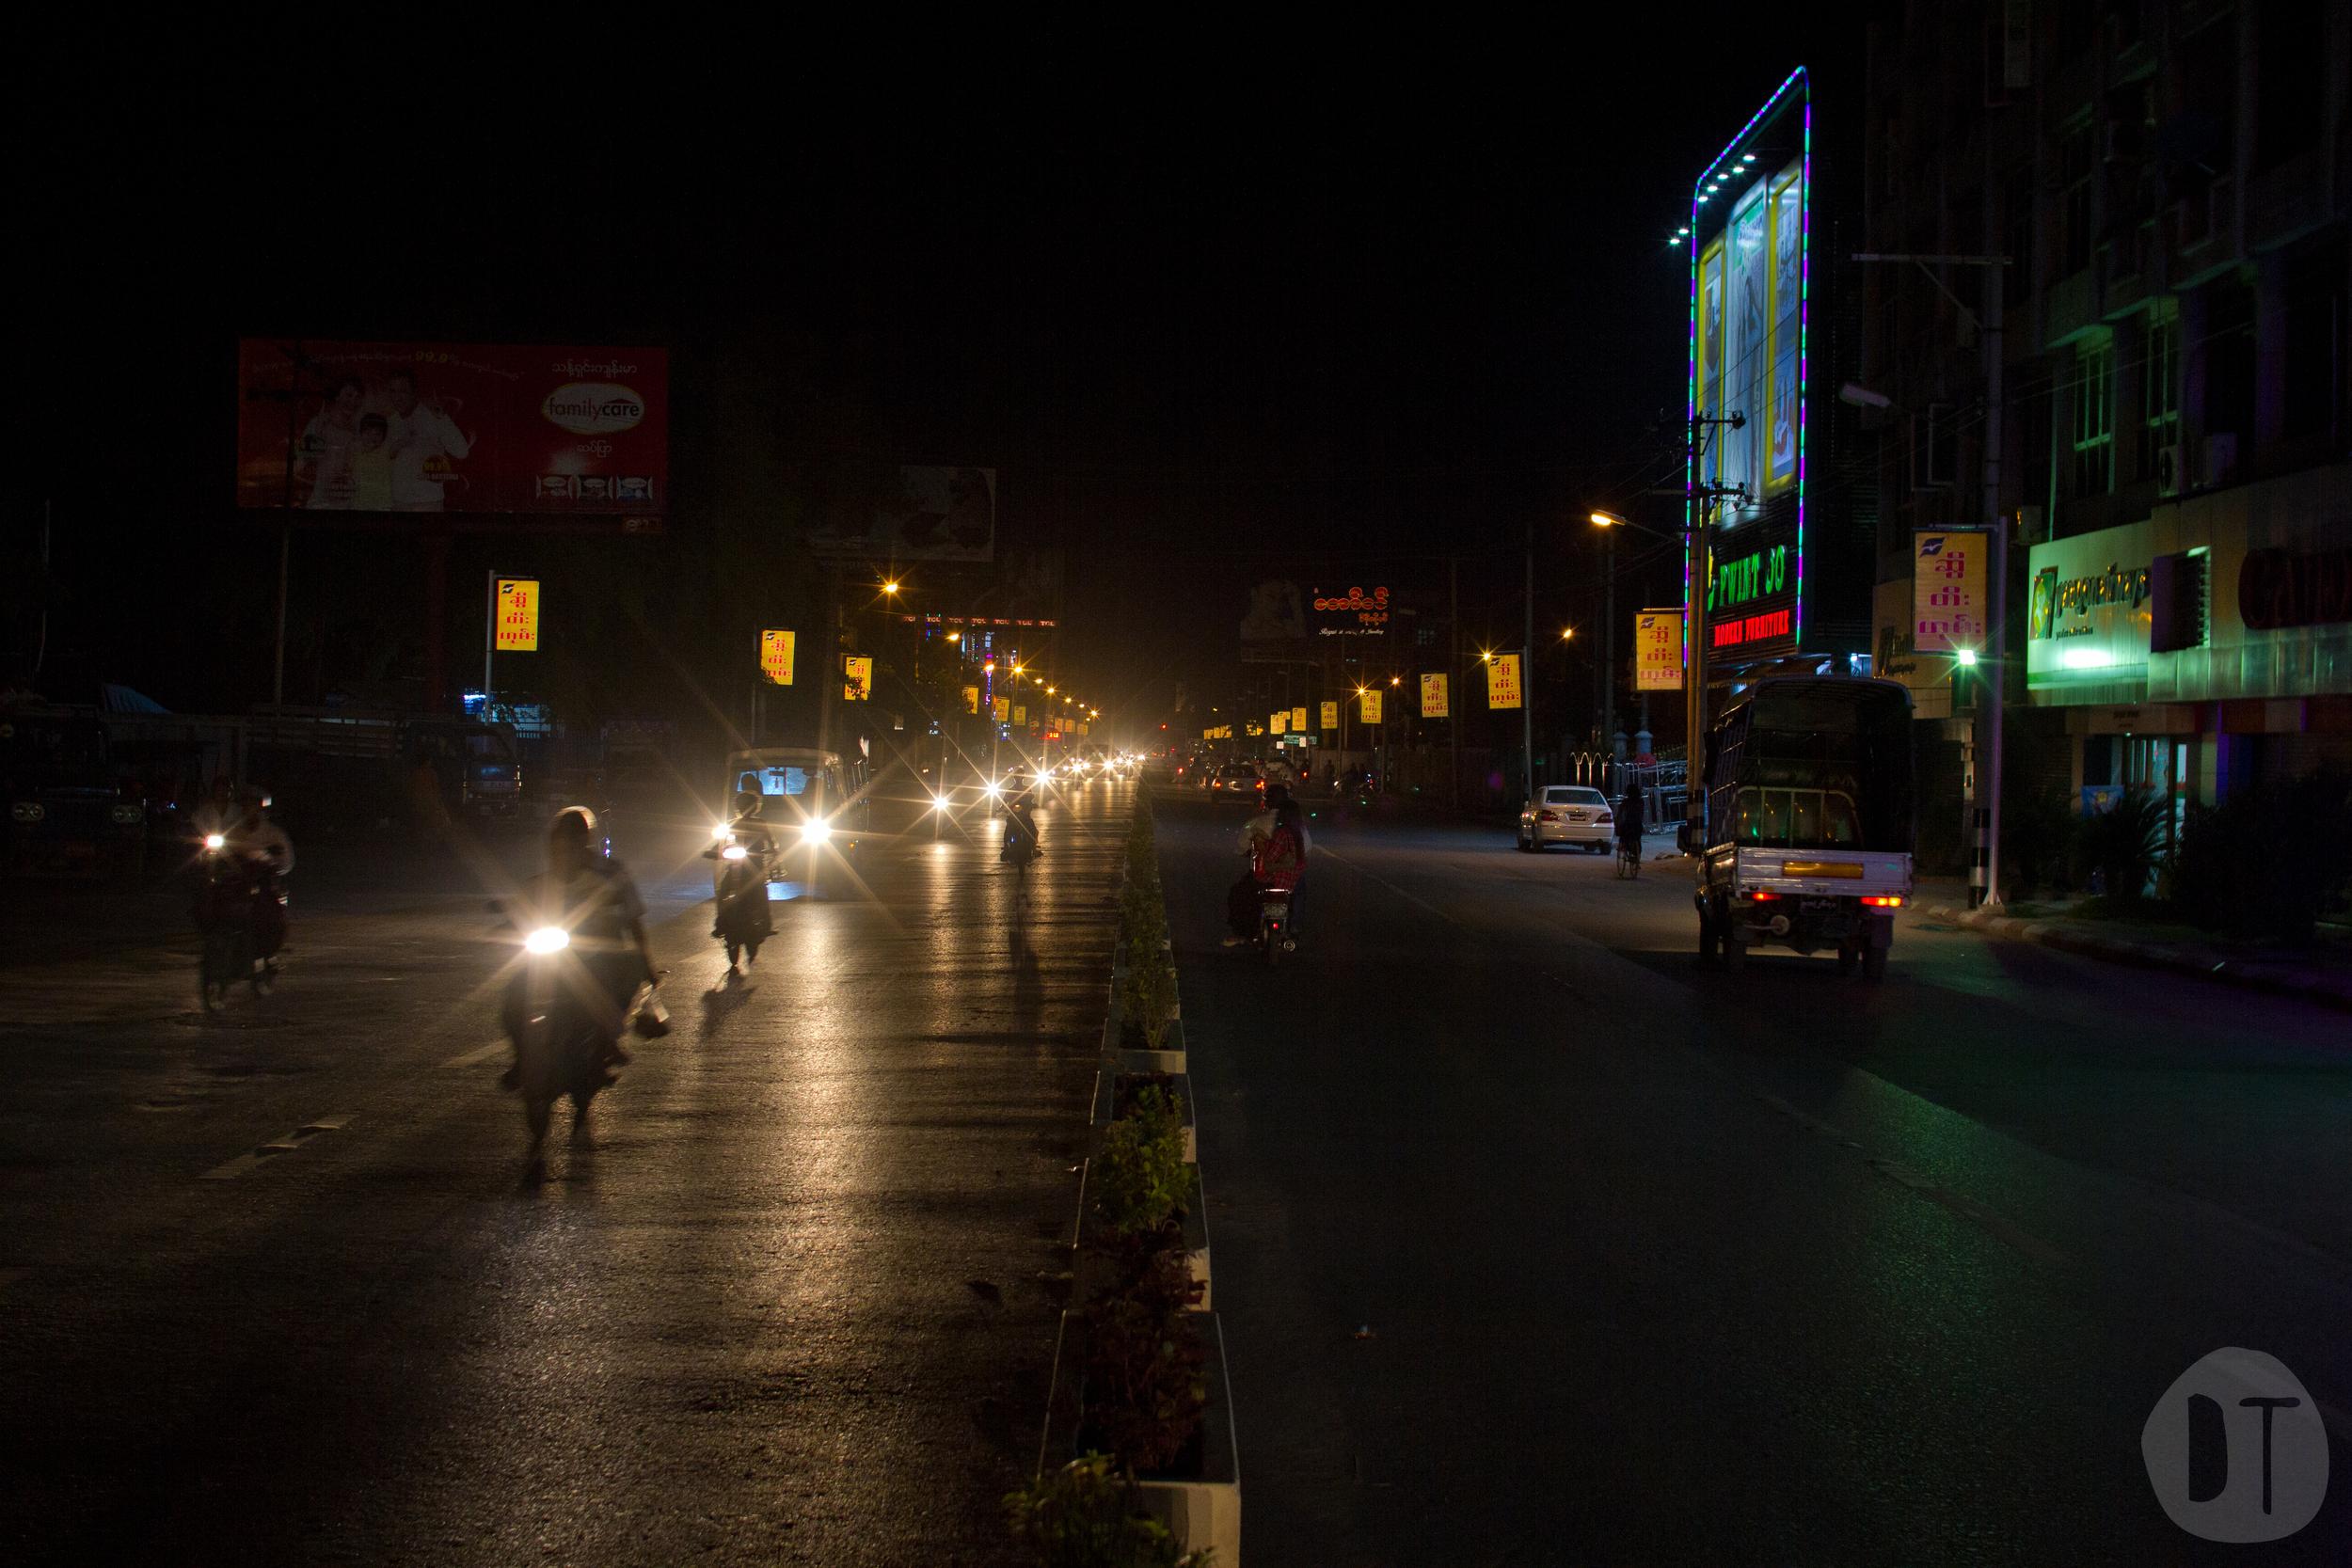 The Road to Mandalay.